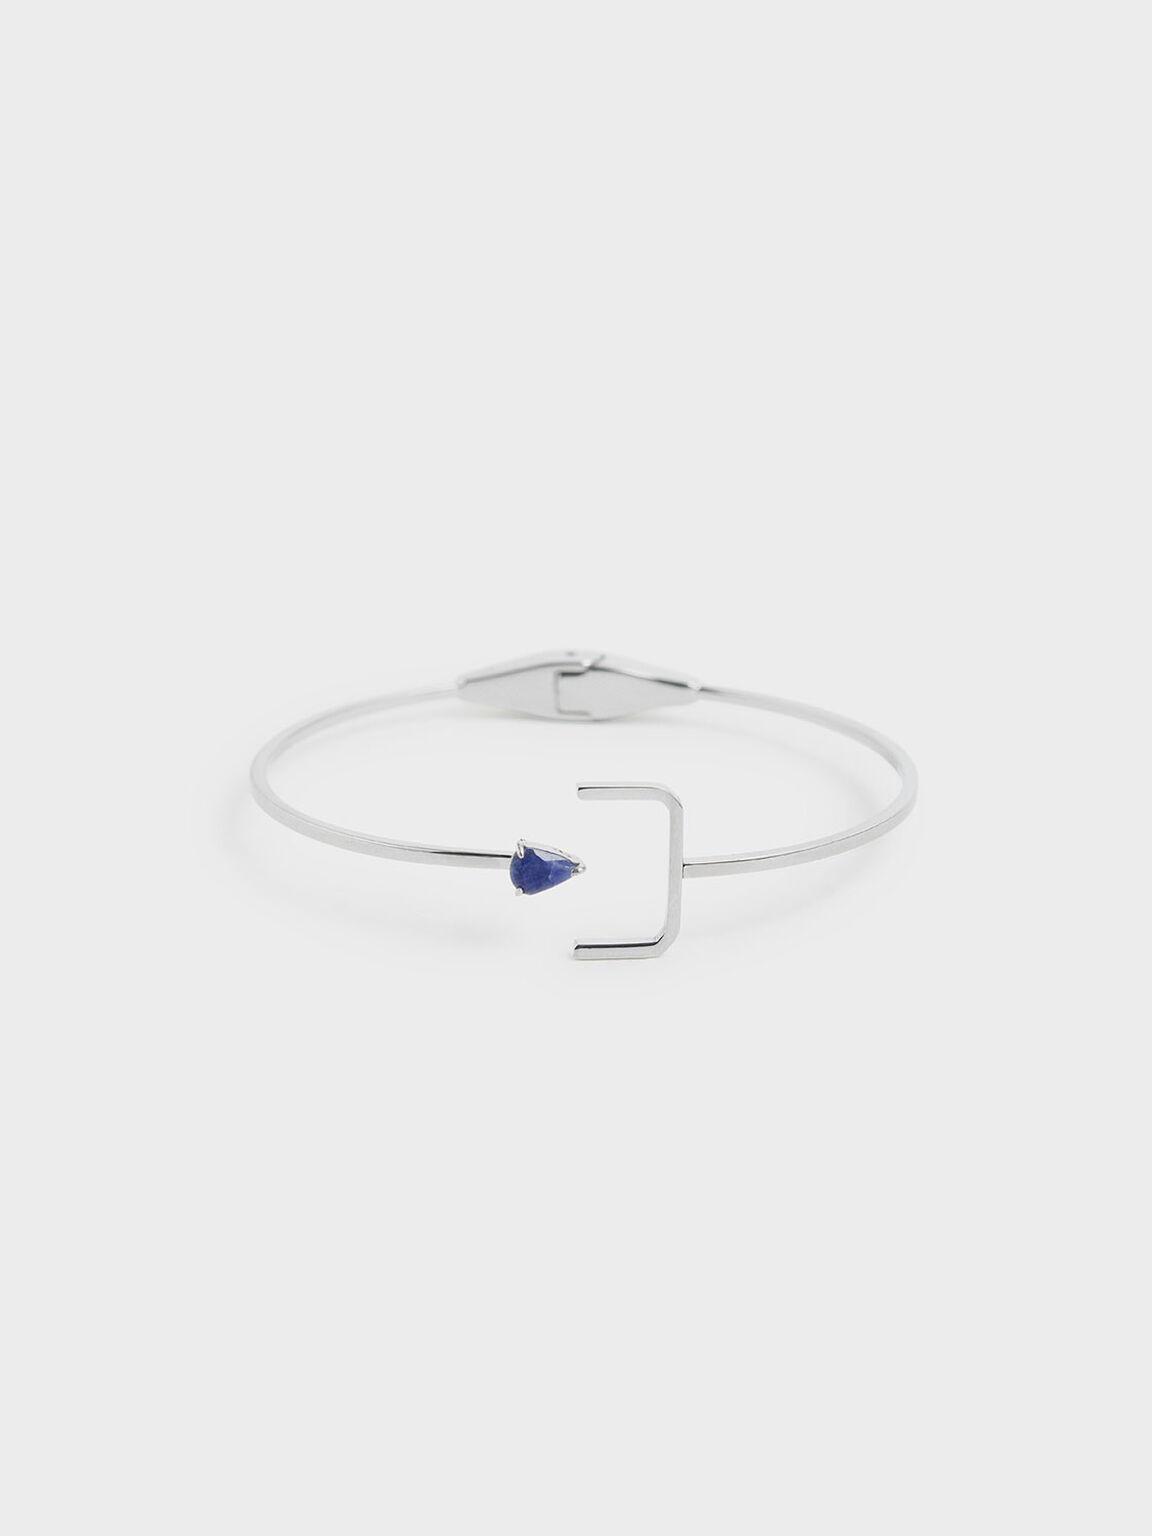 Sodalite Stone Cuff Bracelet, Silver, hi-res